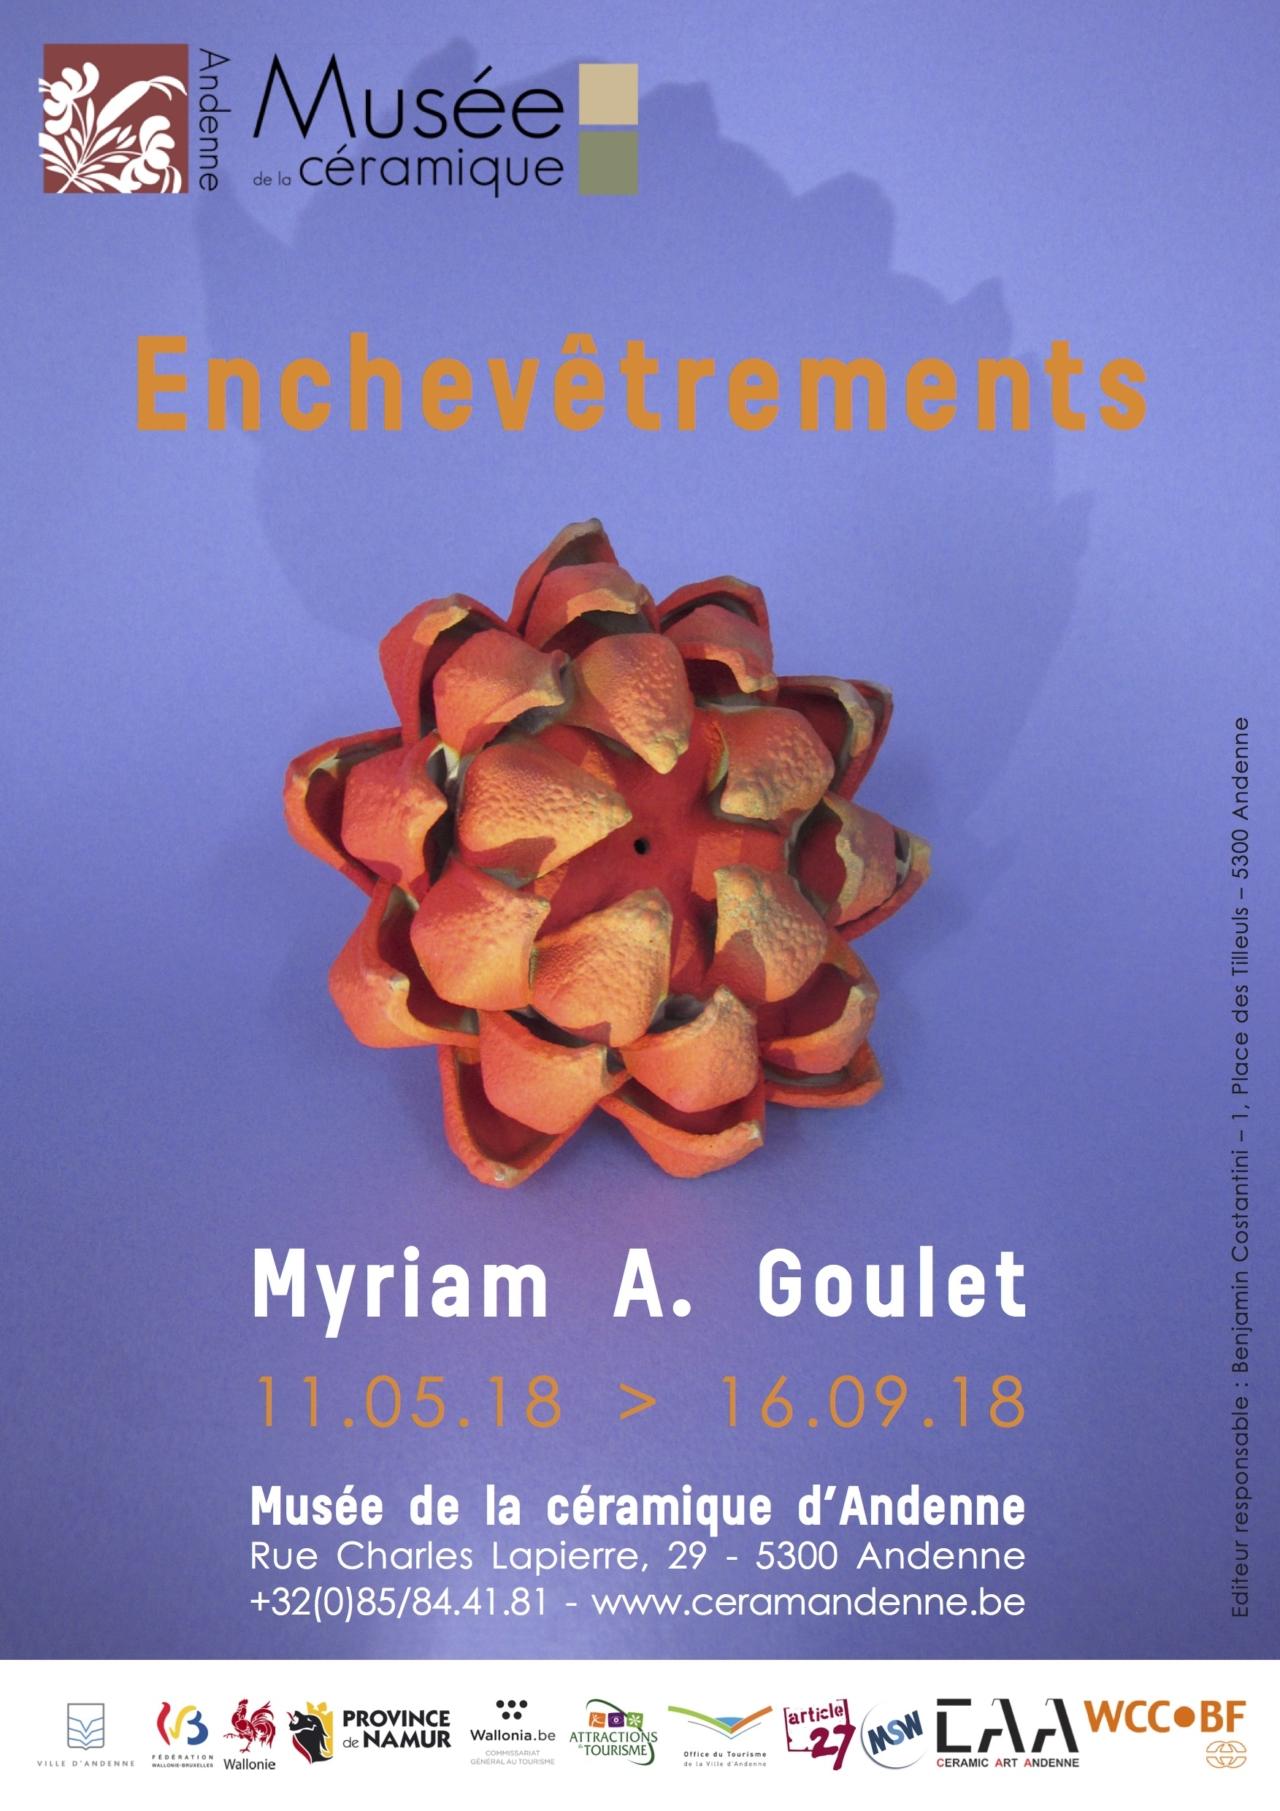 MYRIAM A. GOULET News